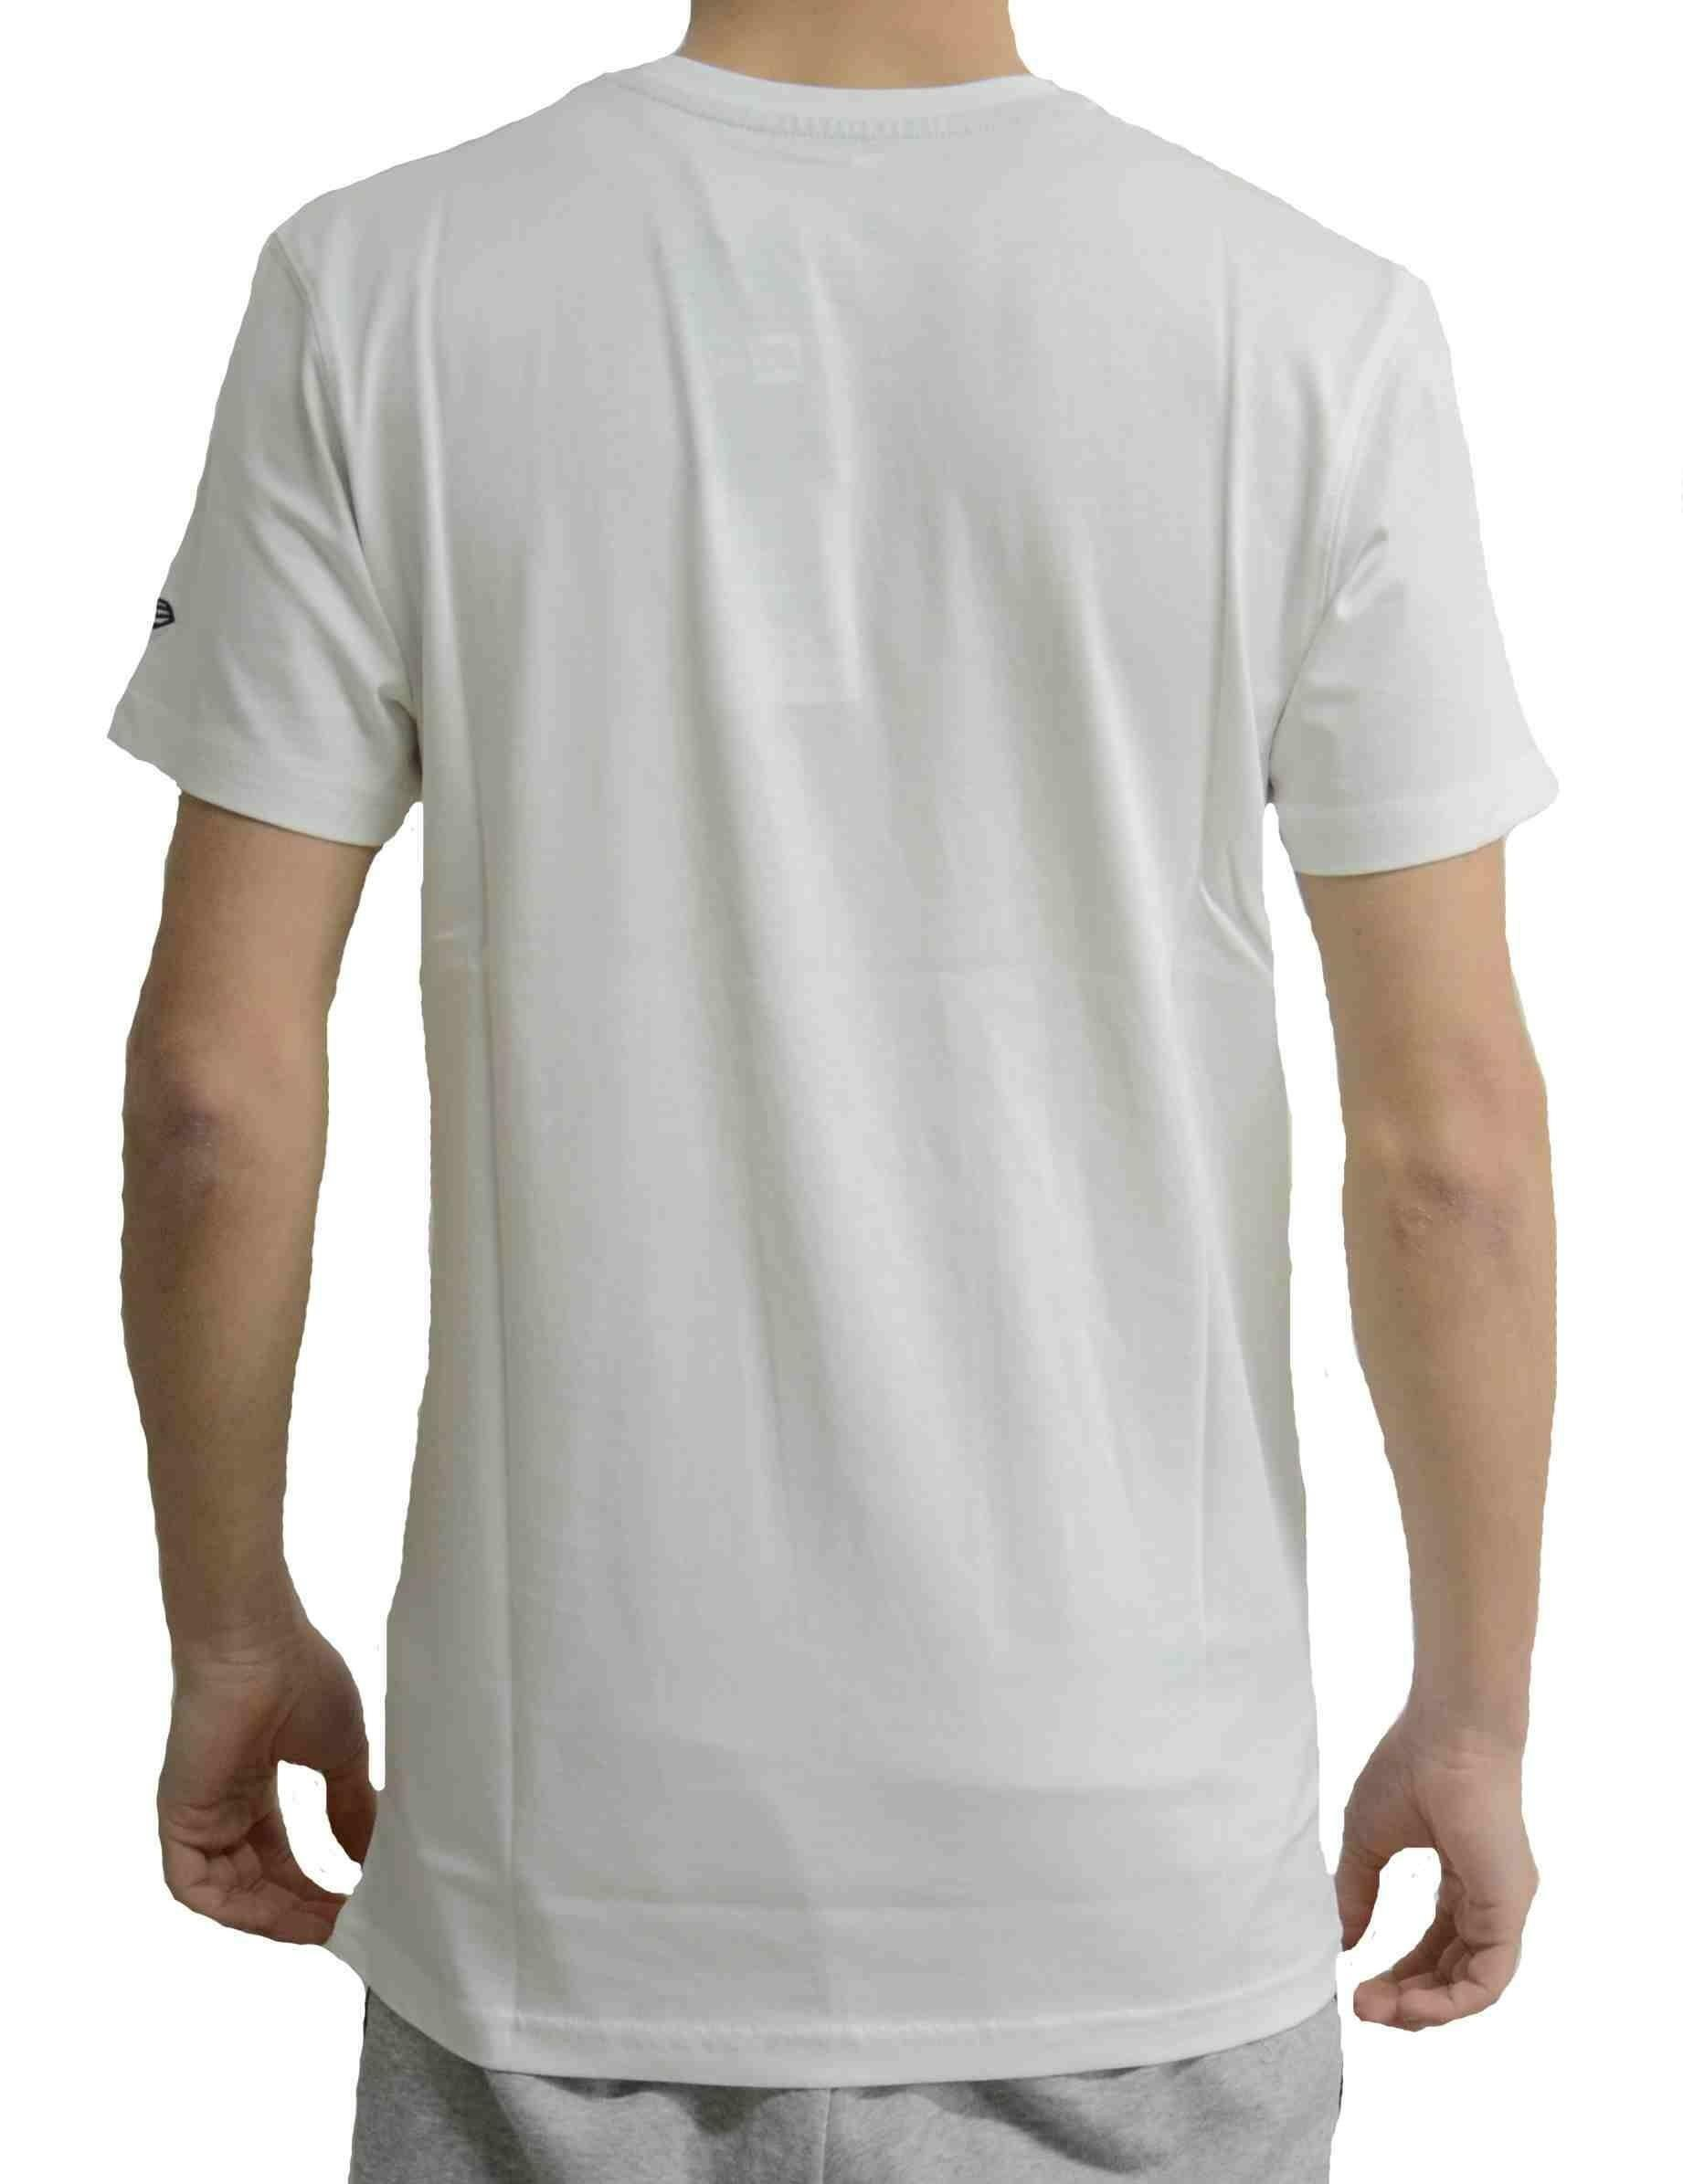 new era new era mlb t-shirt uomo bianca